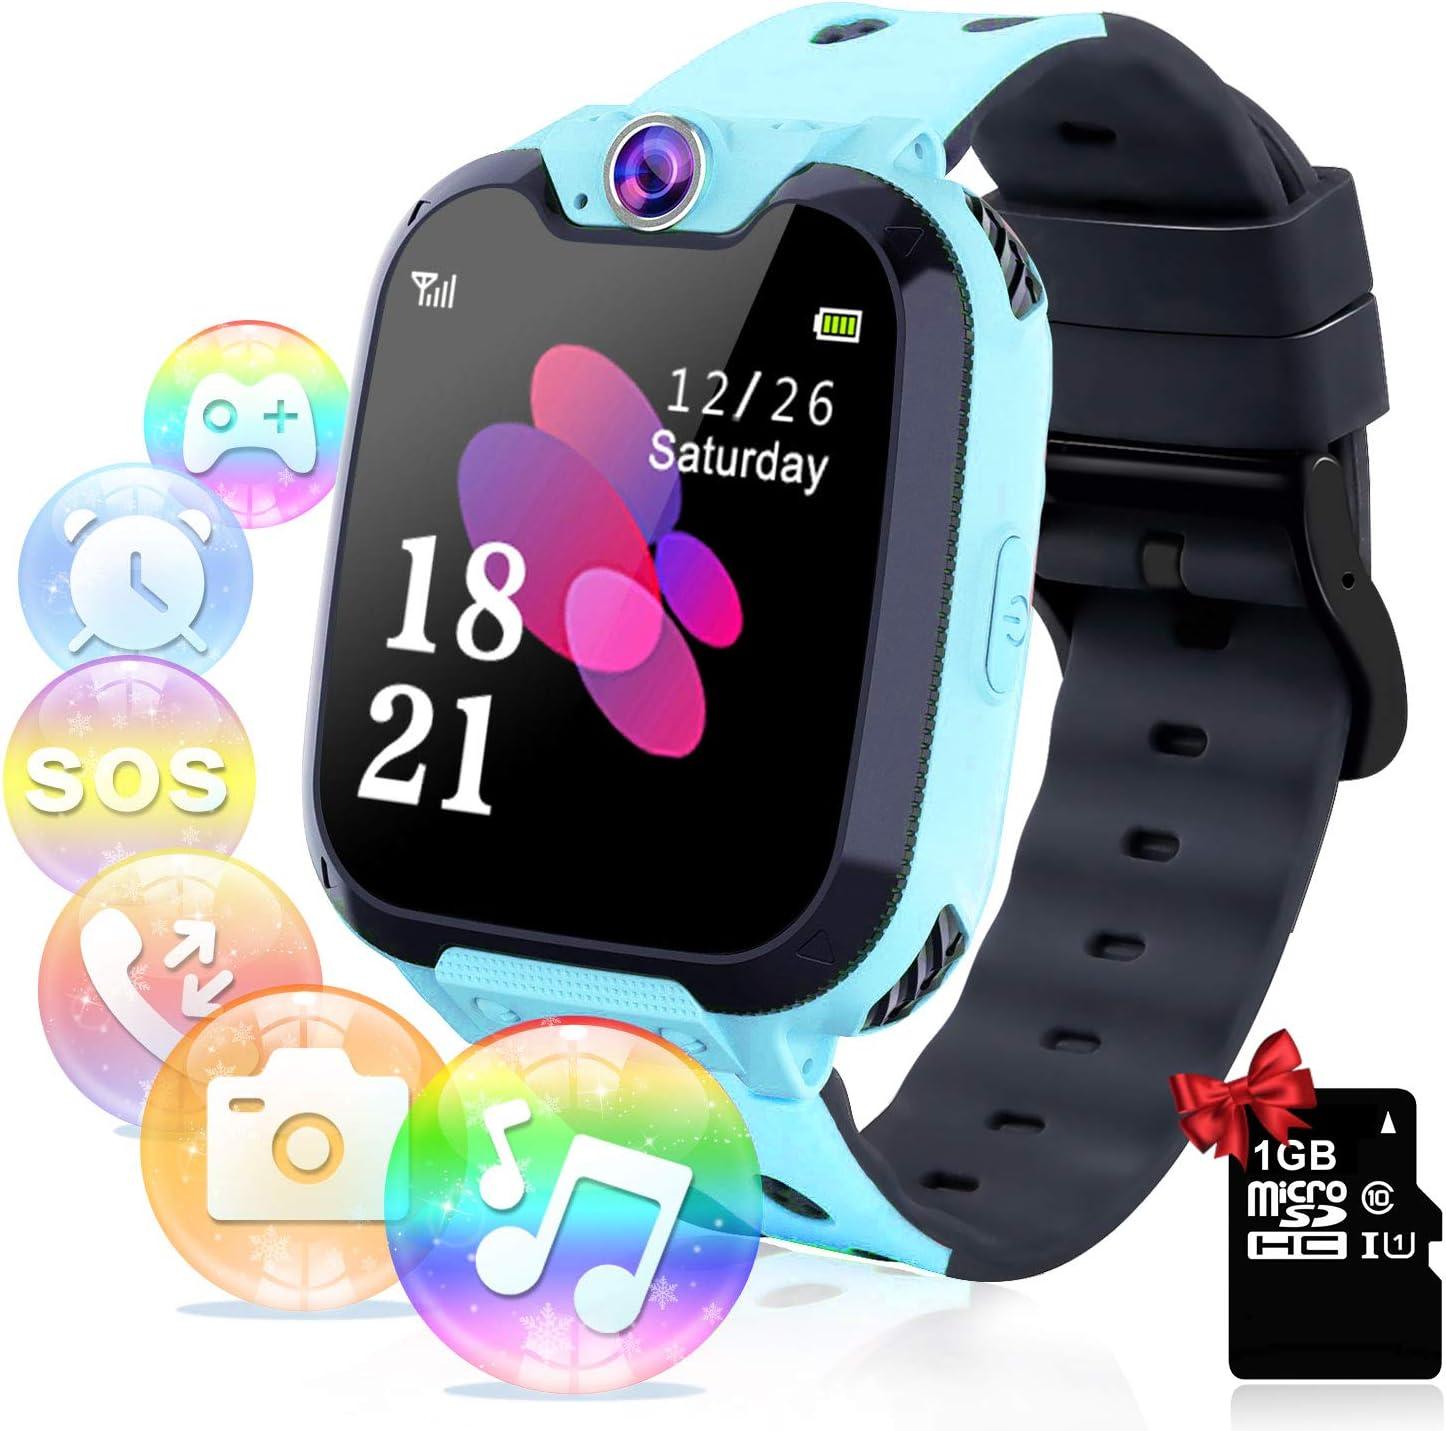 Relojes para Niños - Música Smartwatch para Niños Niña Game Watch (Tarjeta SD de 1GB incluida Pantalla táctil Relojes Inteligentes con Llamada Juego Cámara Música (Azul)